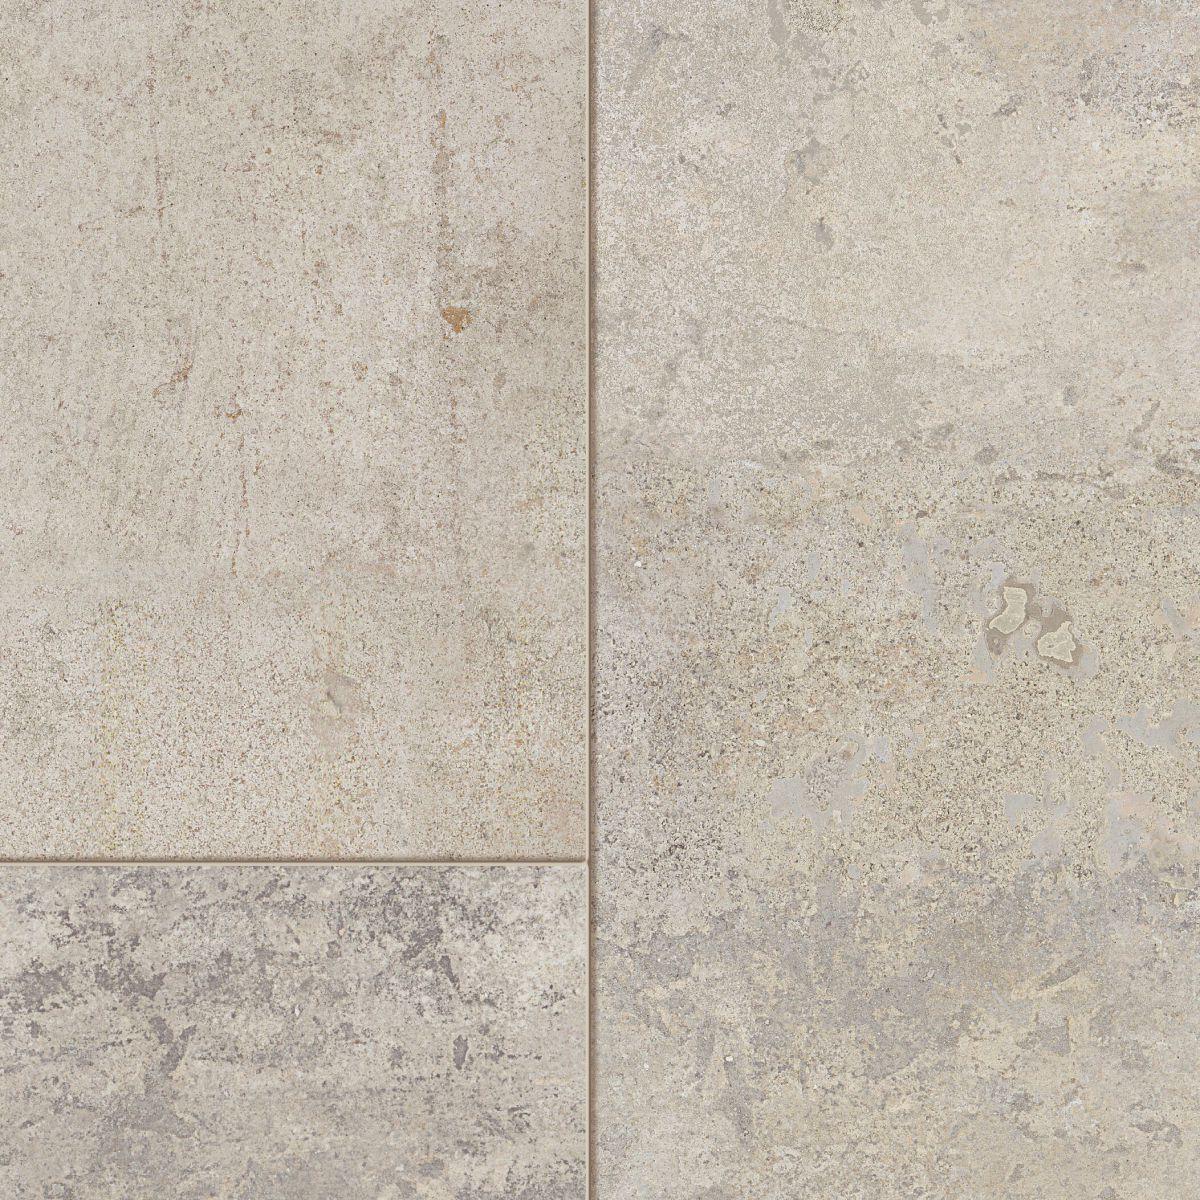 Avatara vloeren steen O4 detail